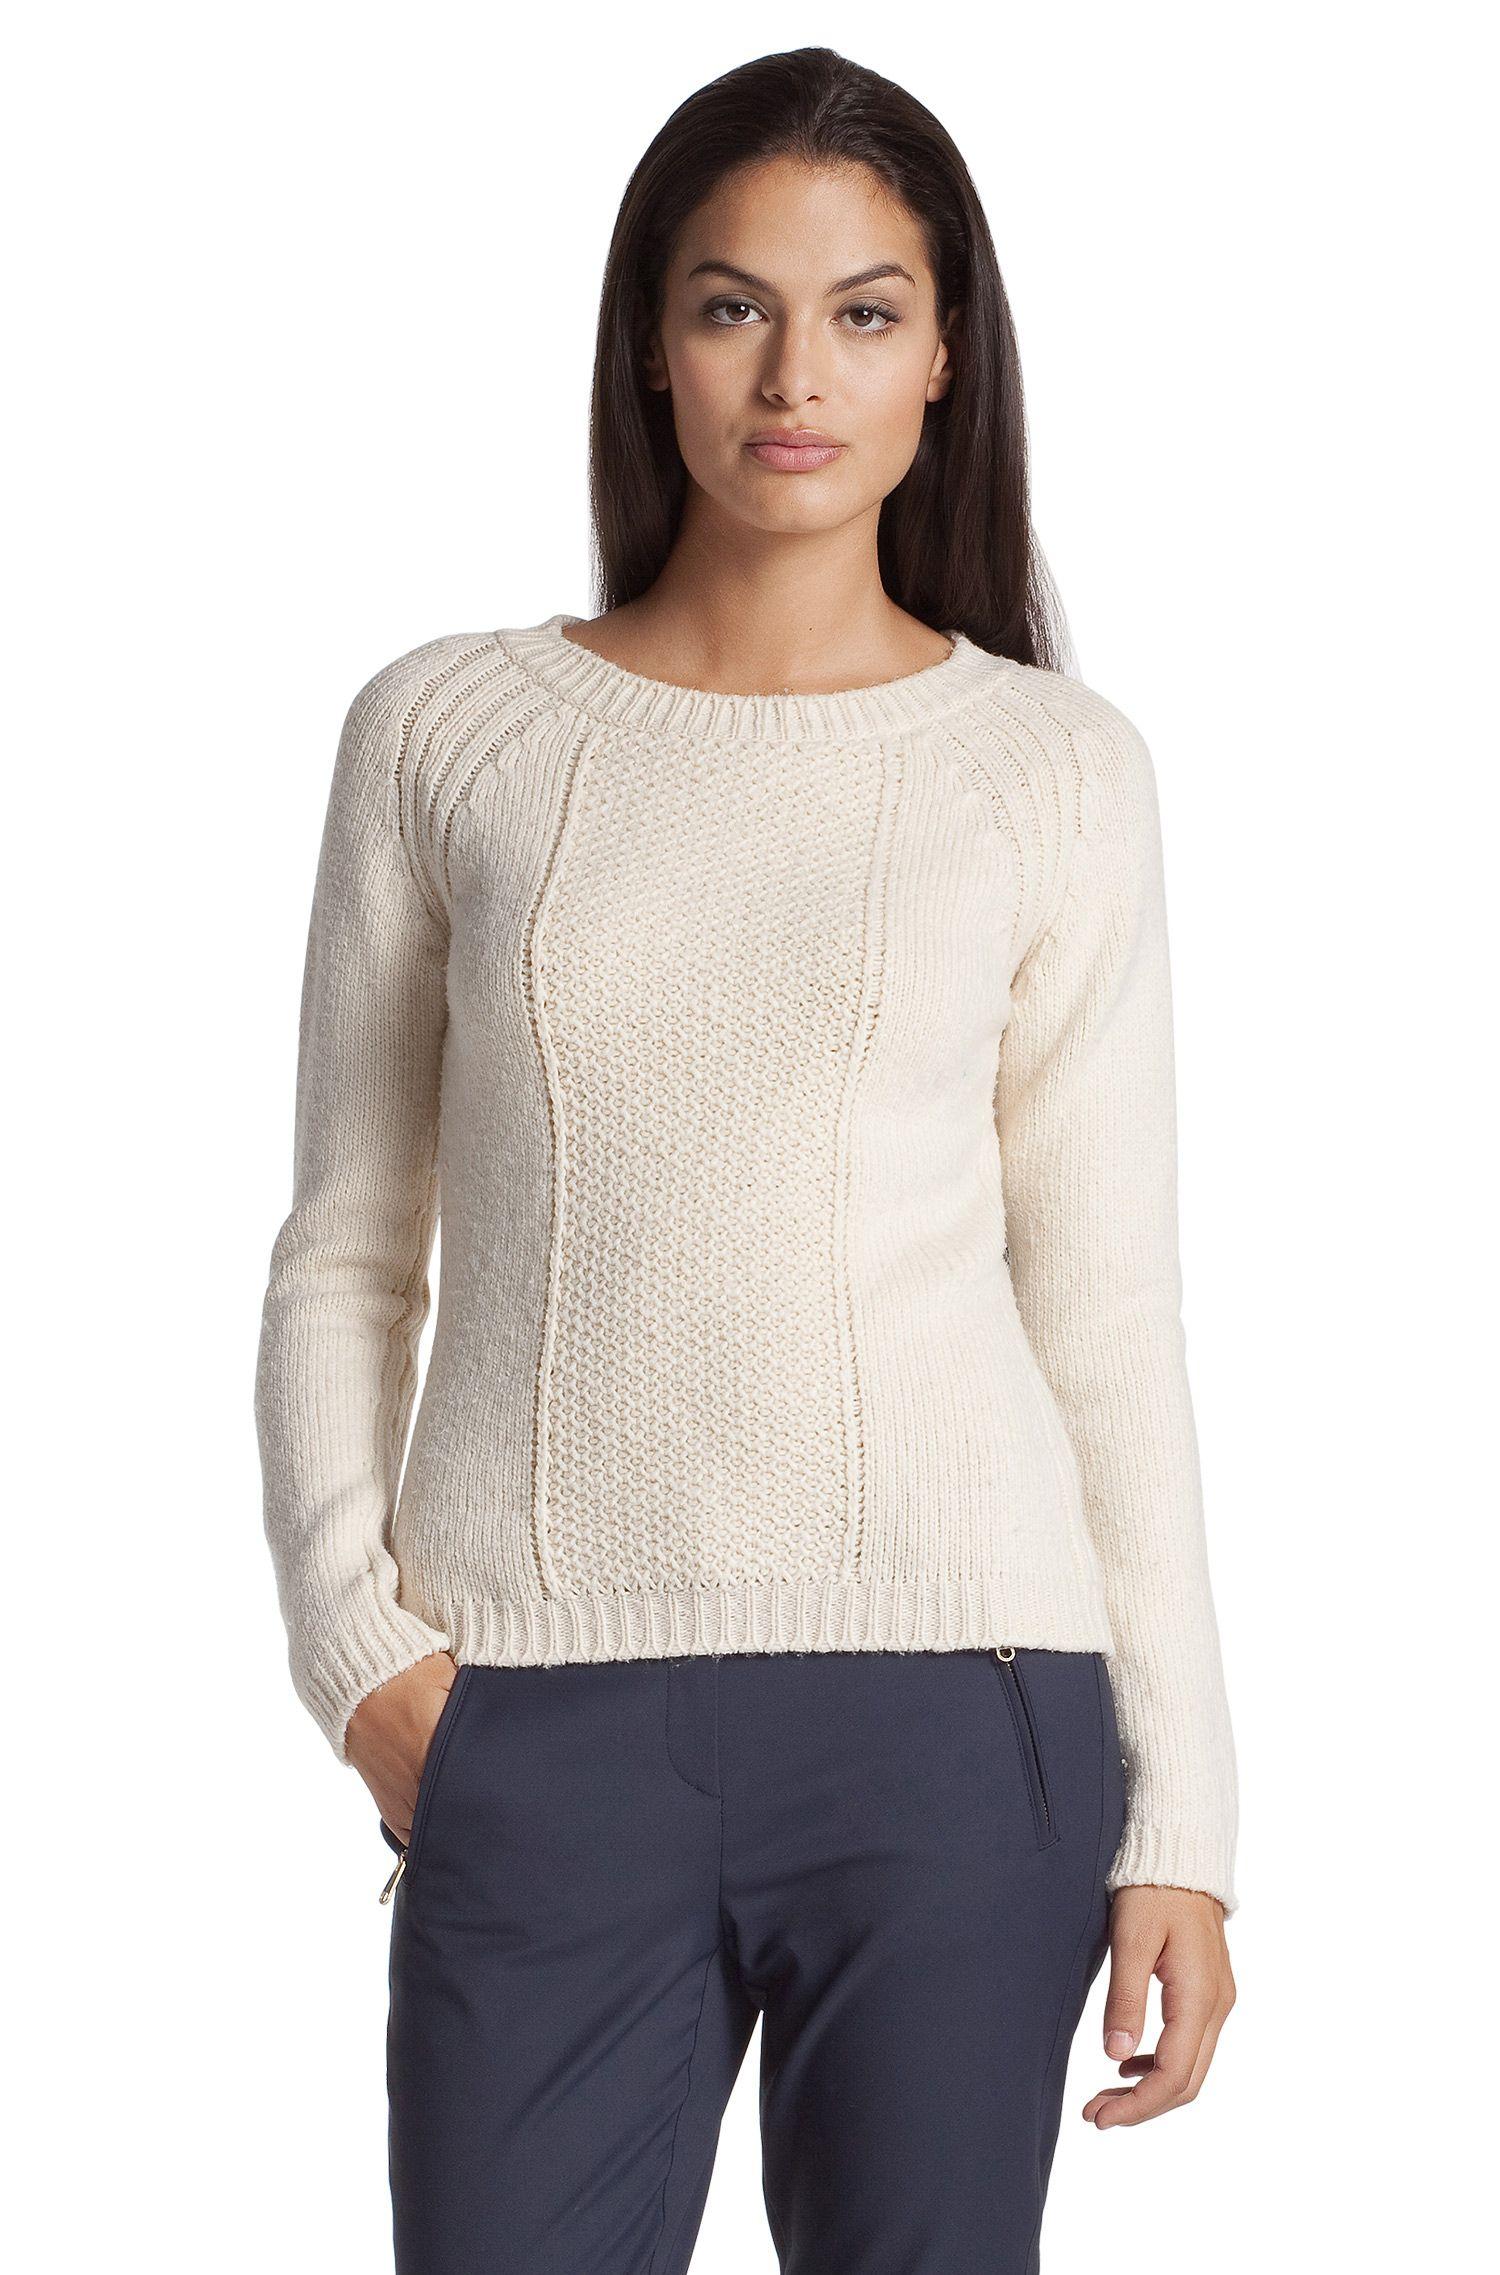 Strick-Pullover ´F4469` mit variierendem Dessin